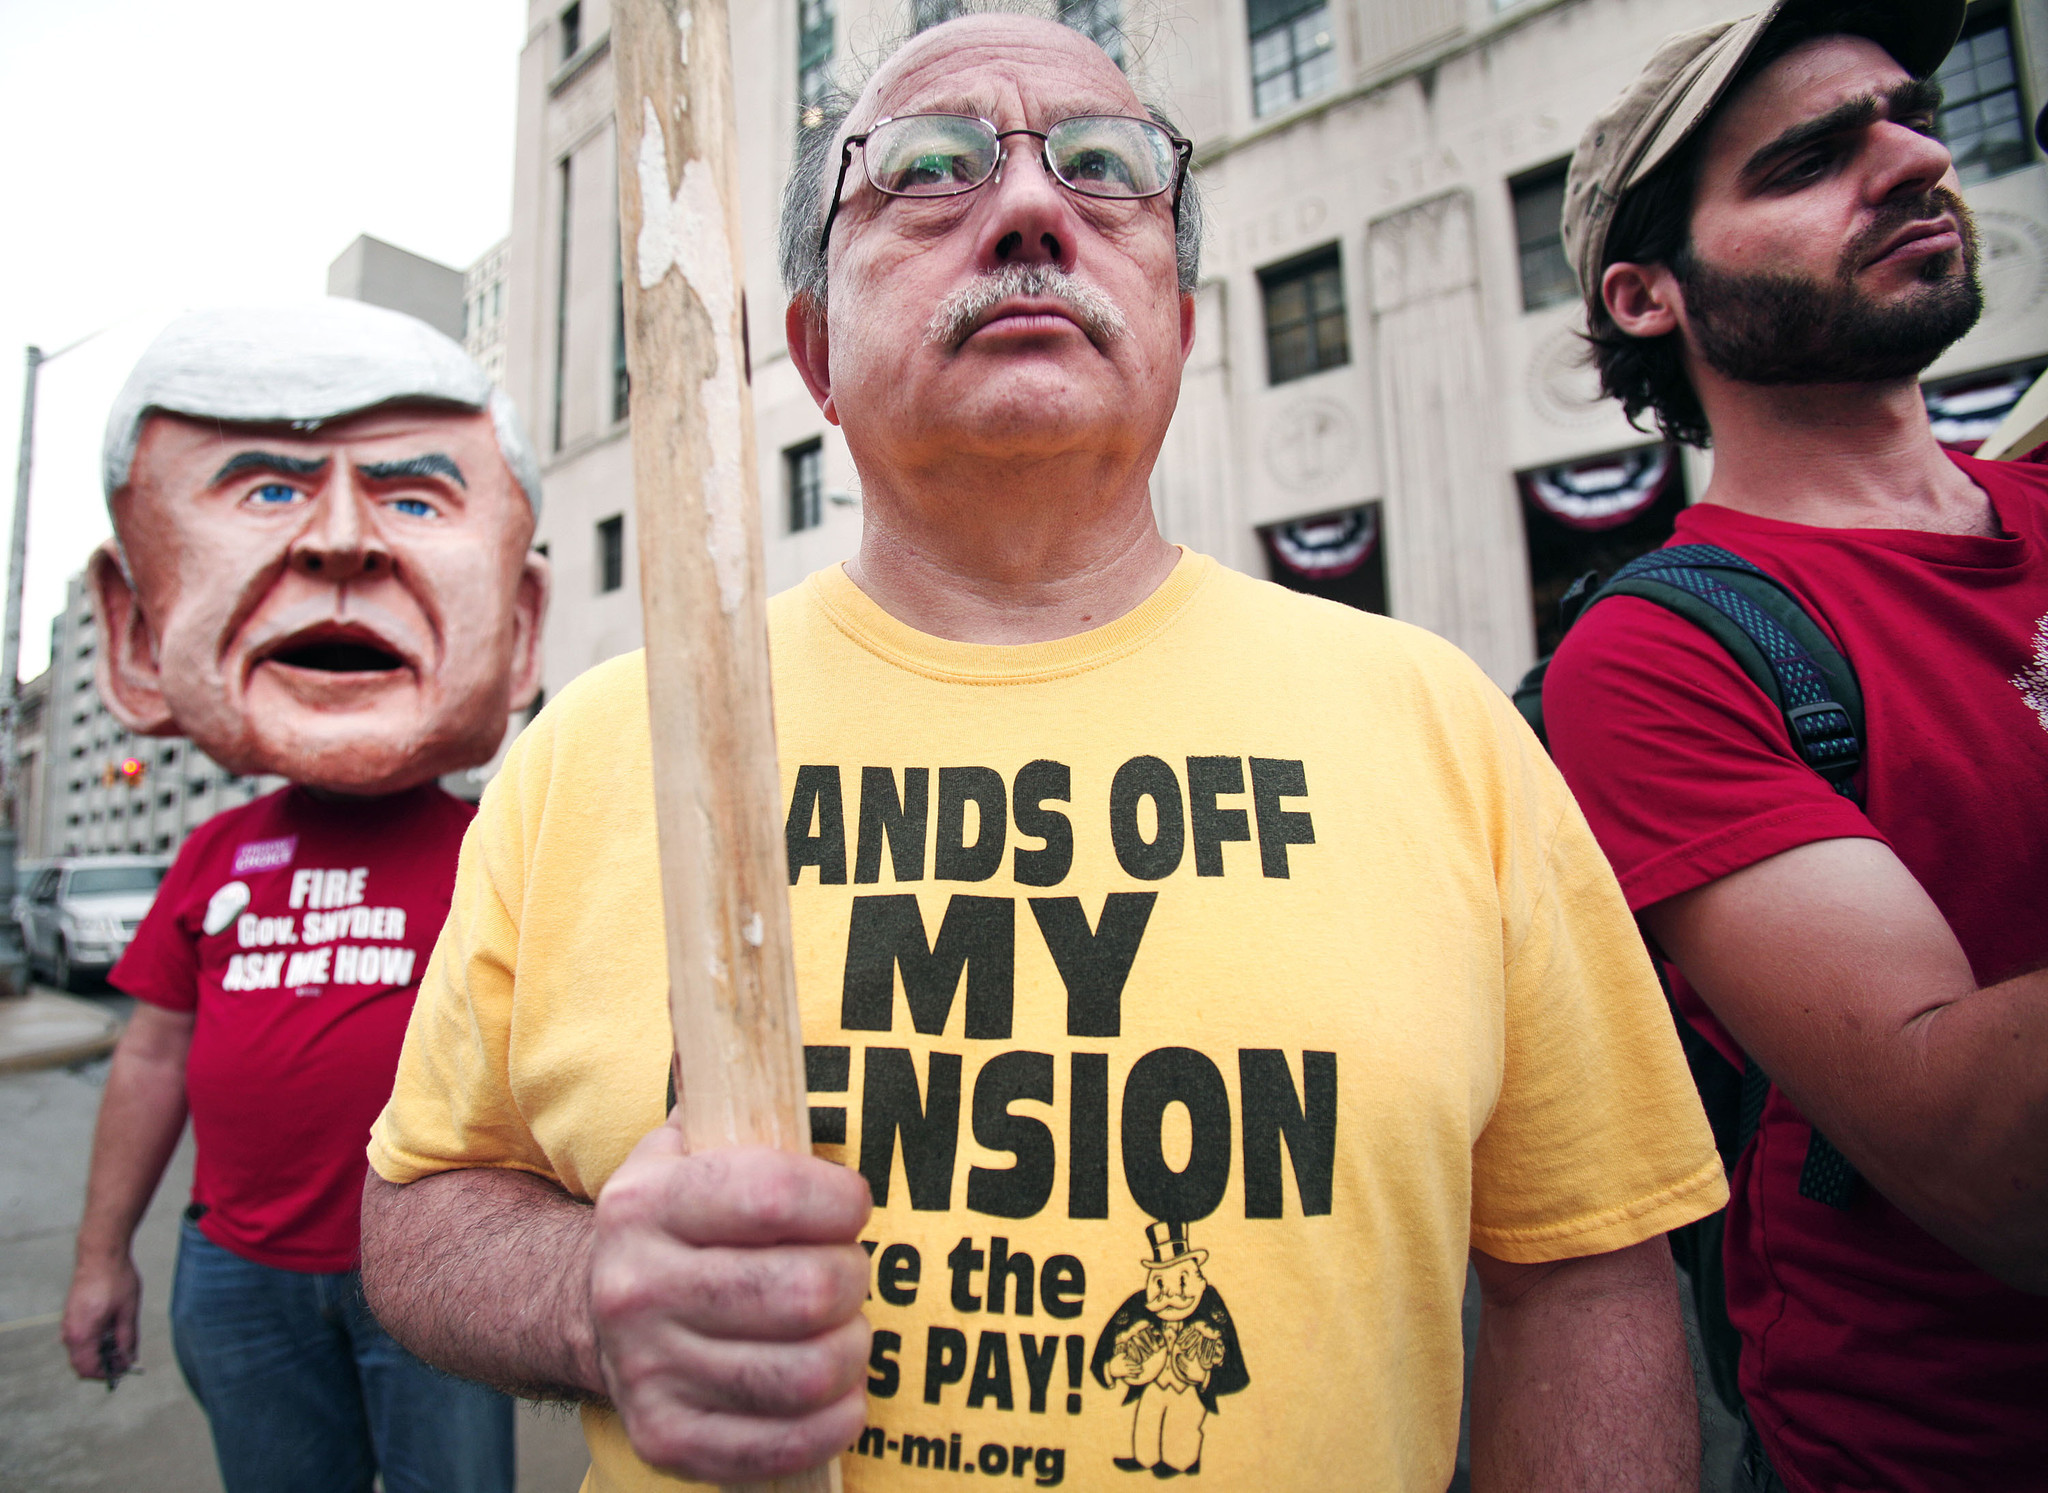 Detroit, hoping to leave bankruptcy, warns of 'downward spiral'